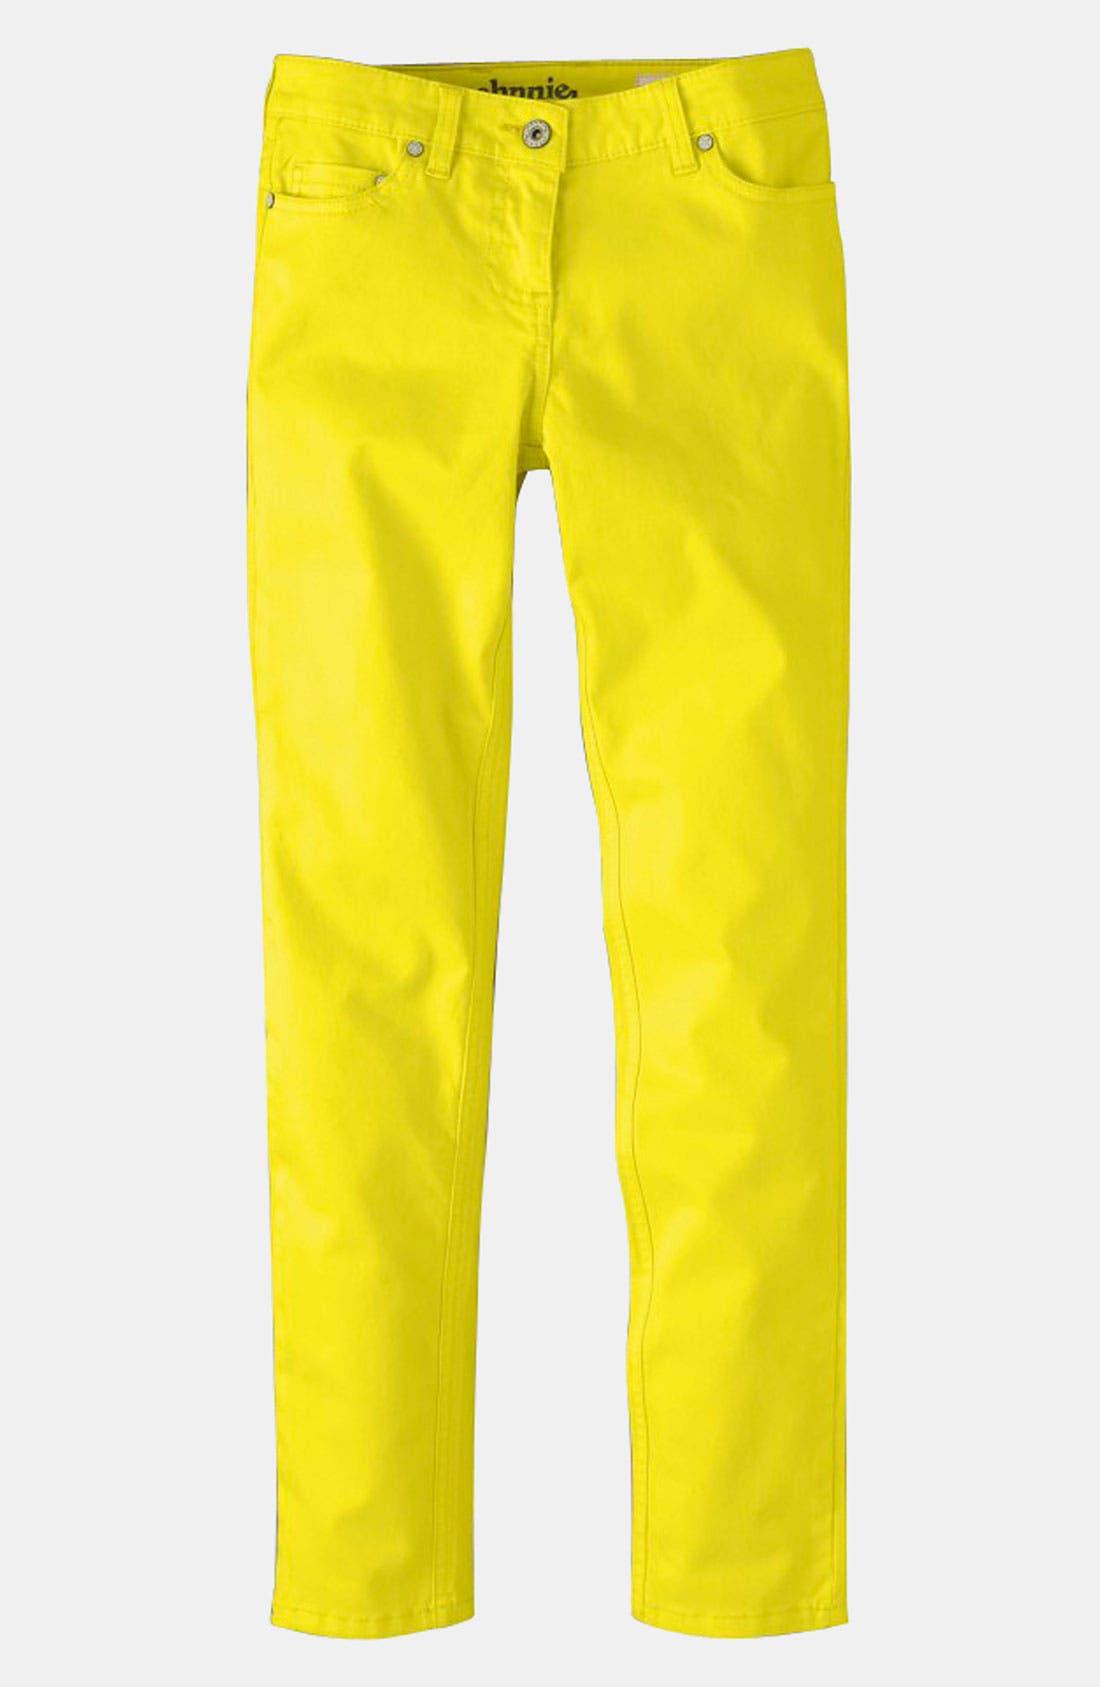 Alternate Image 1 Selected - Johnnie b Skinny Jeans (Big Girls)